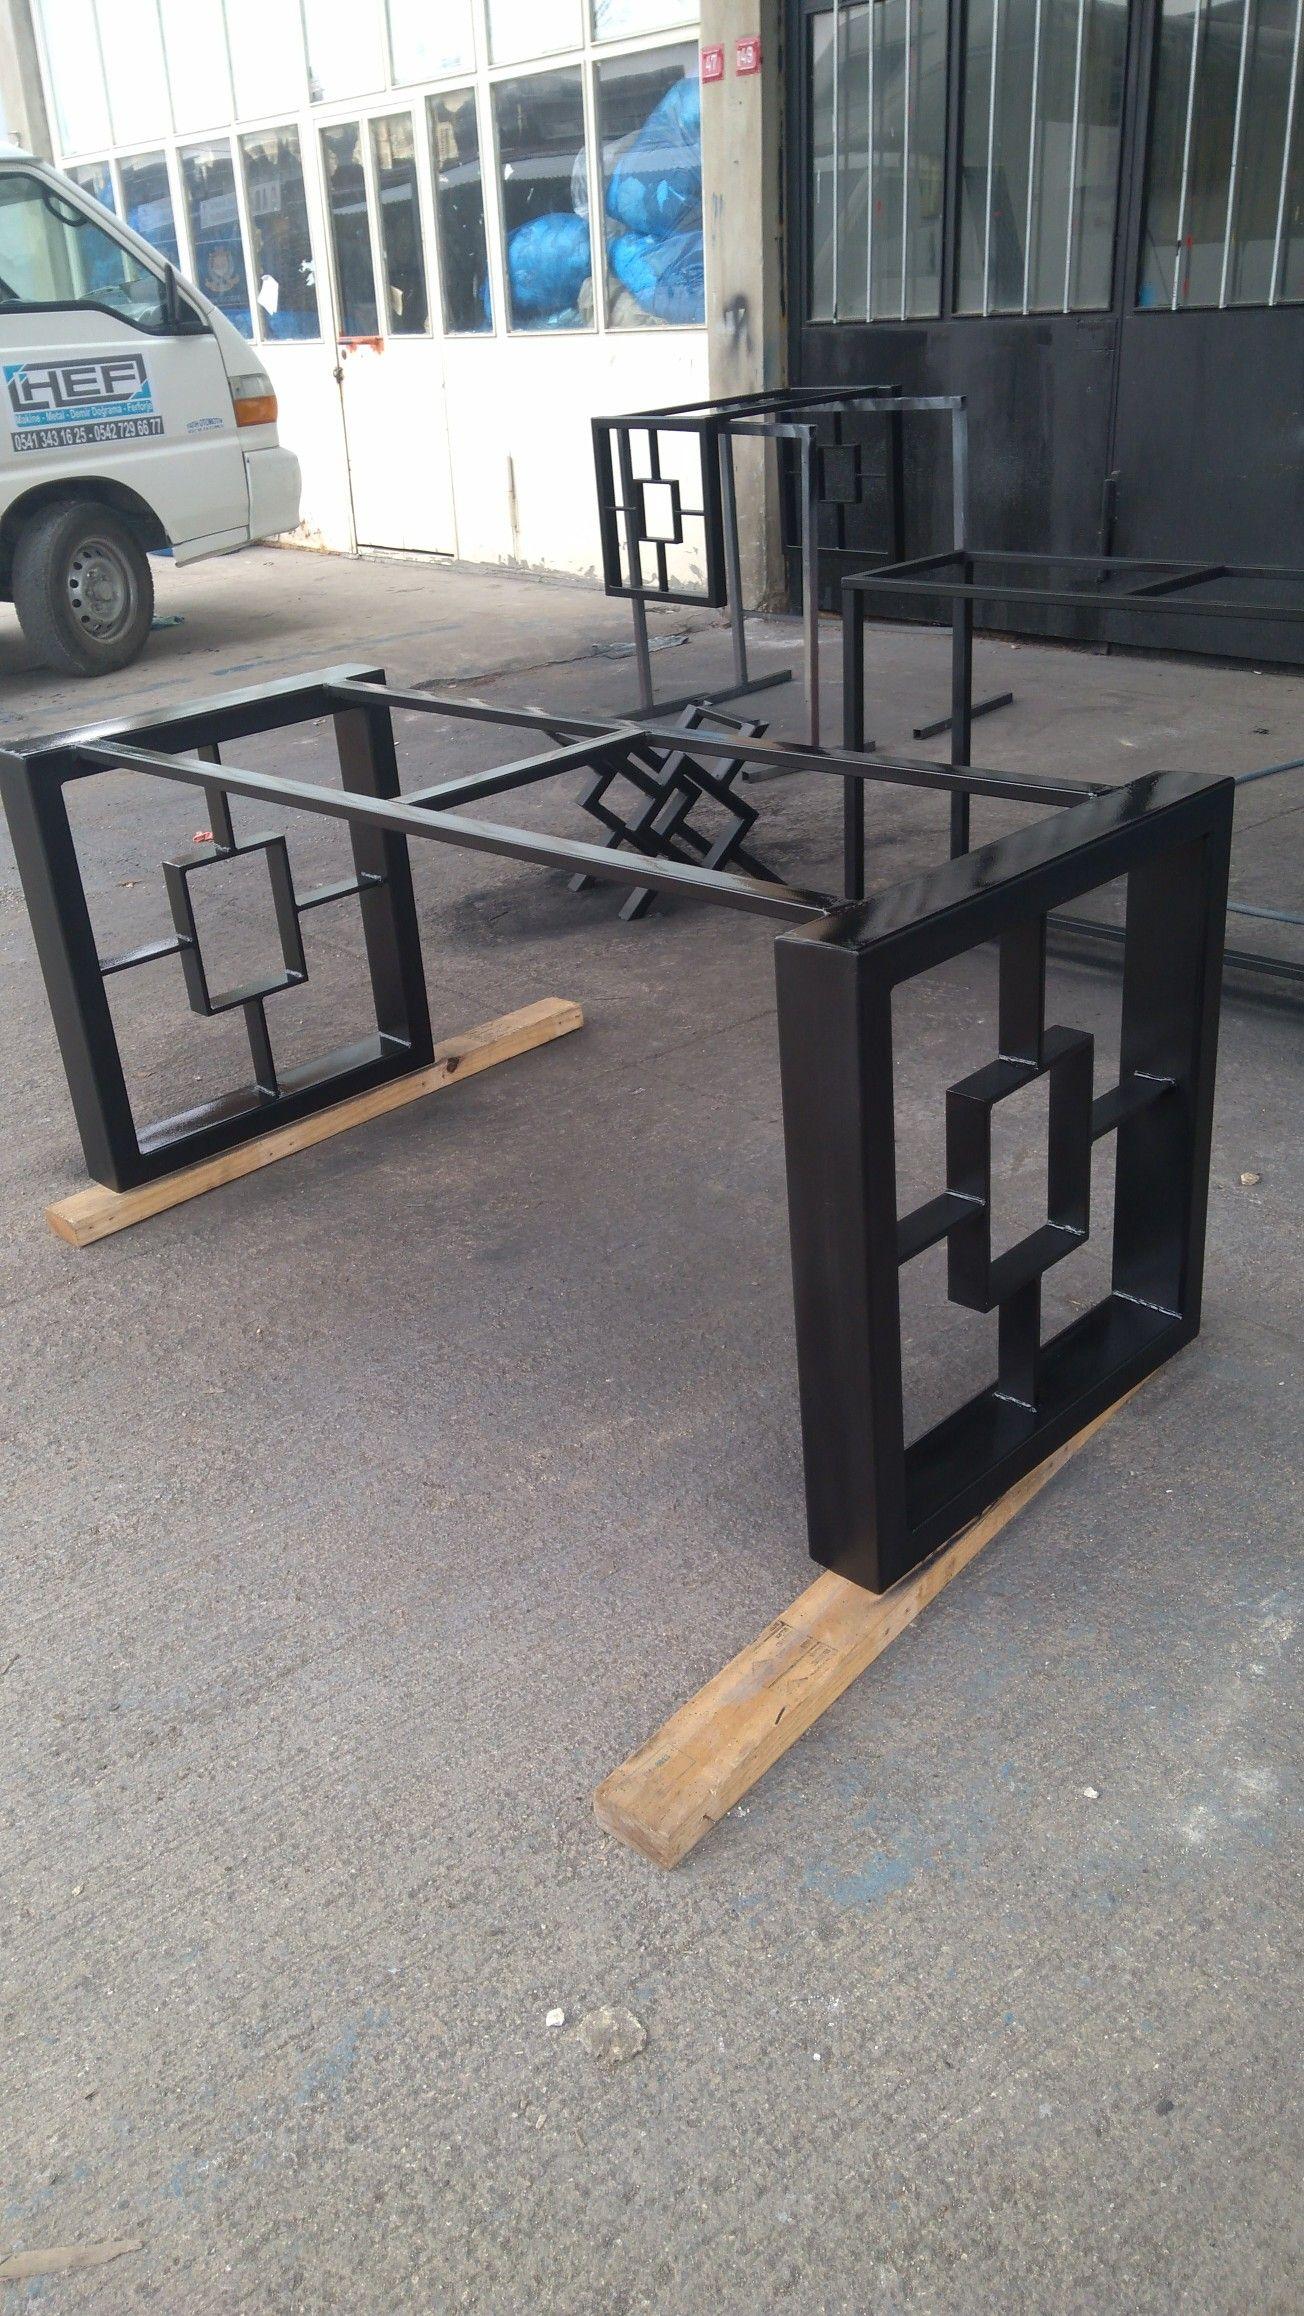 Hef Makina Metal Demir Dograma Ferforje Dekoratif Masa Ayaklari